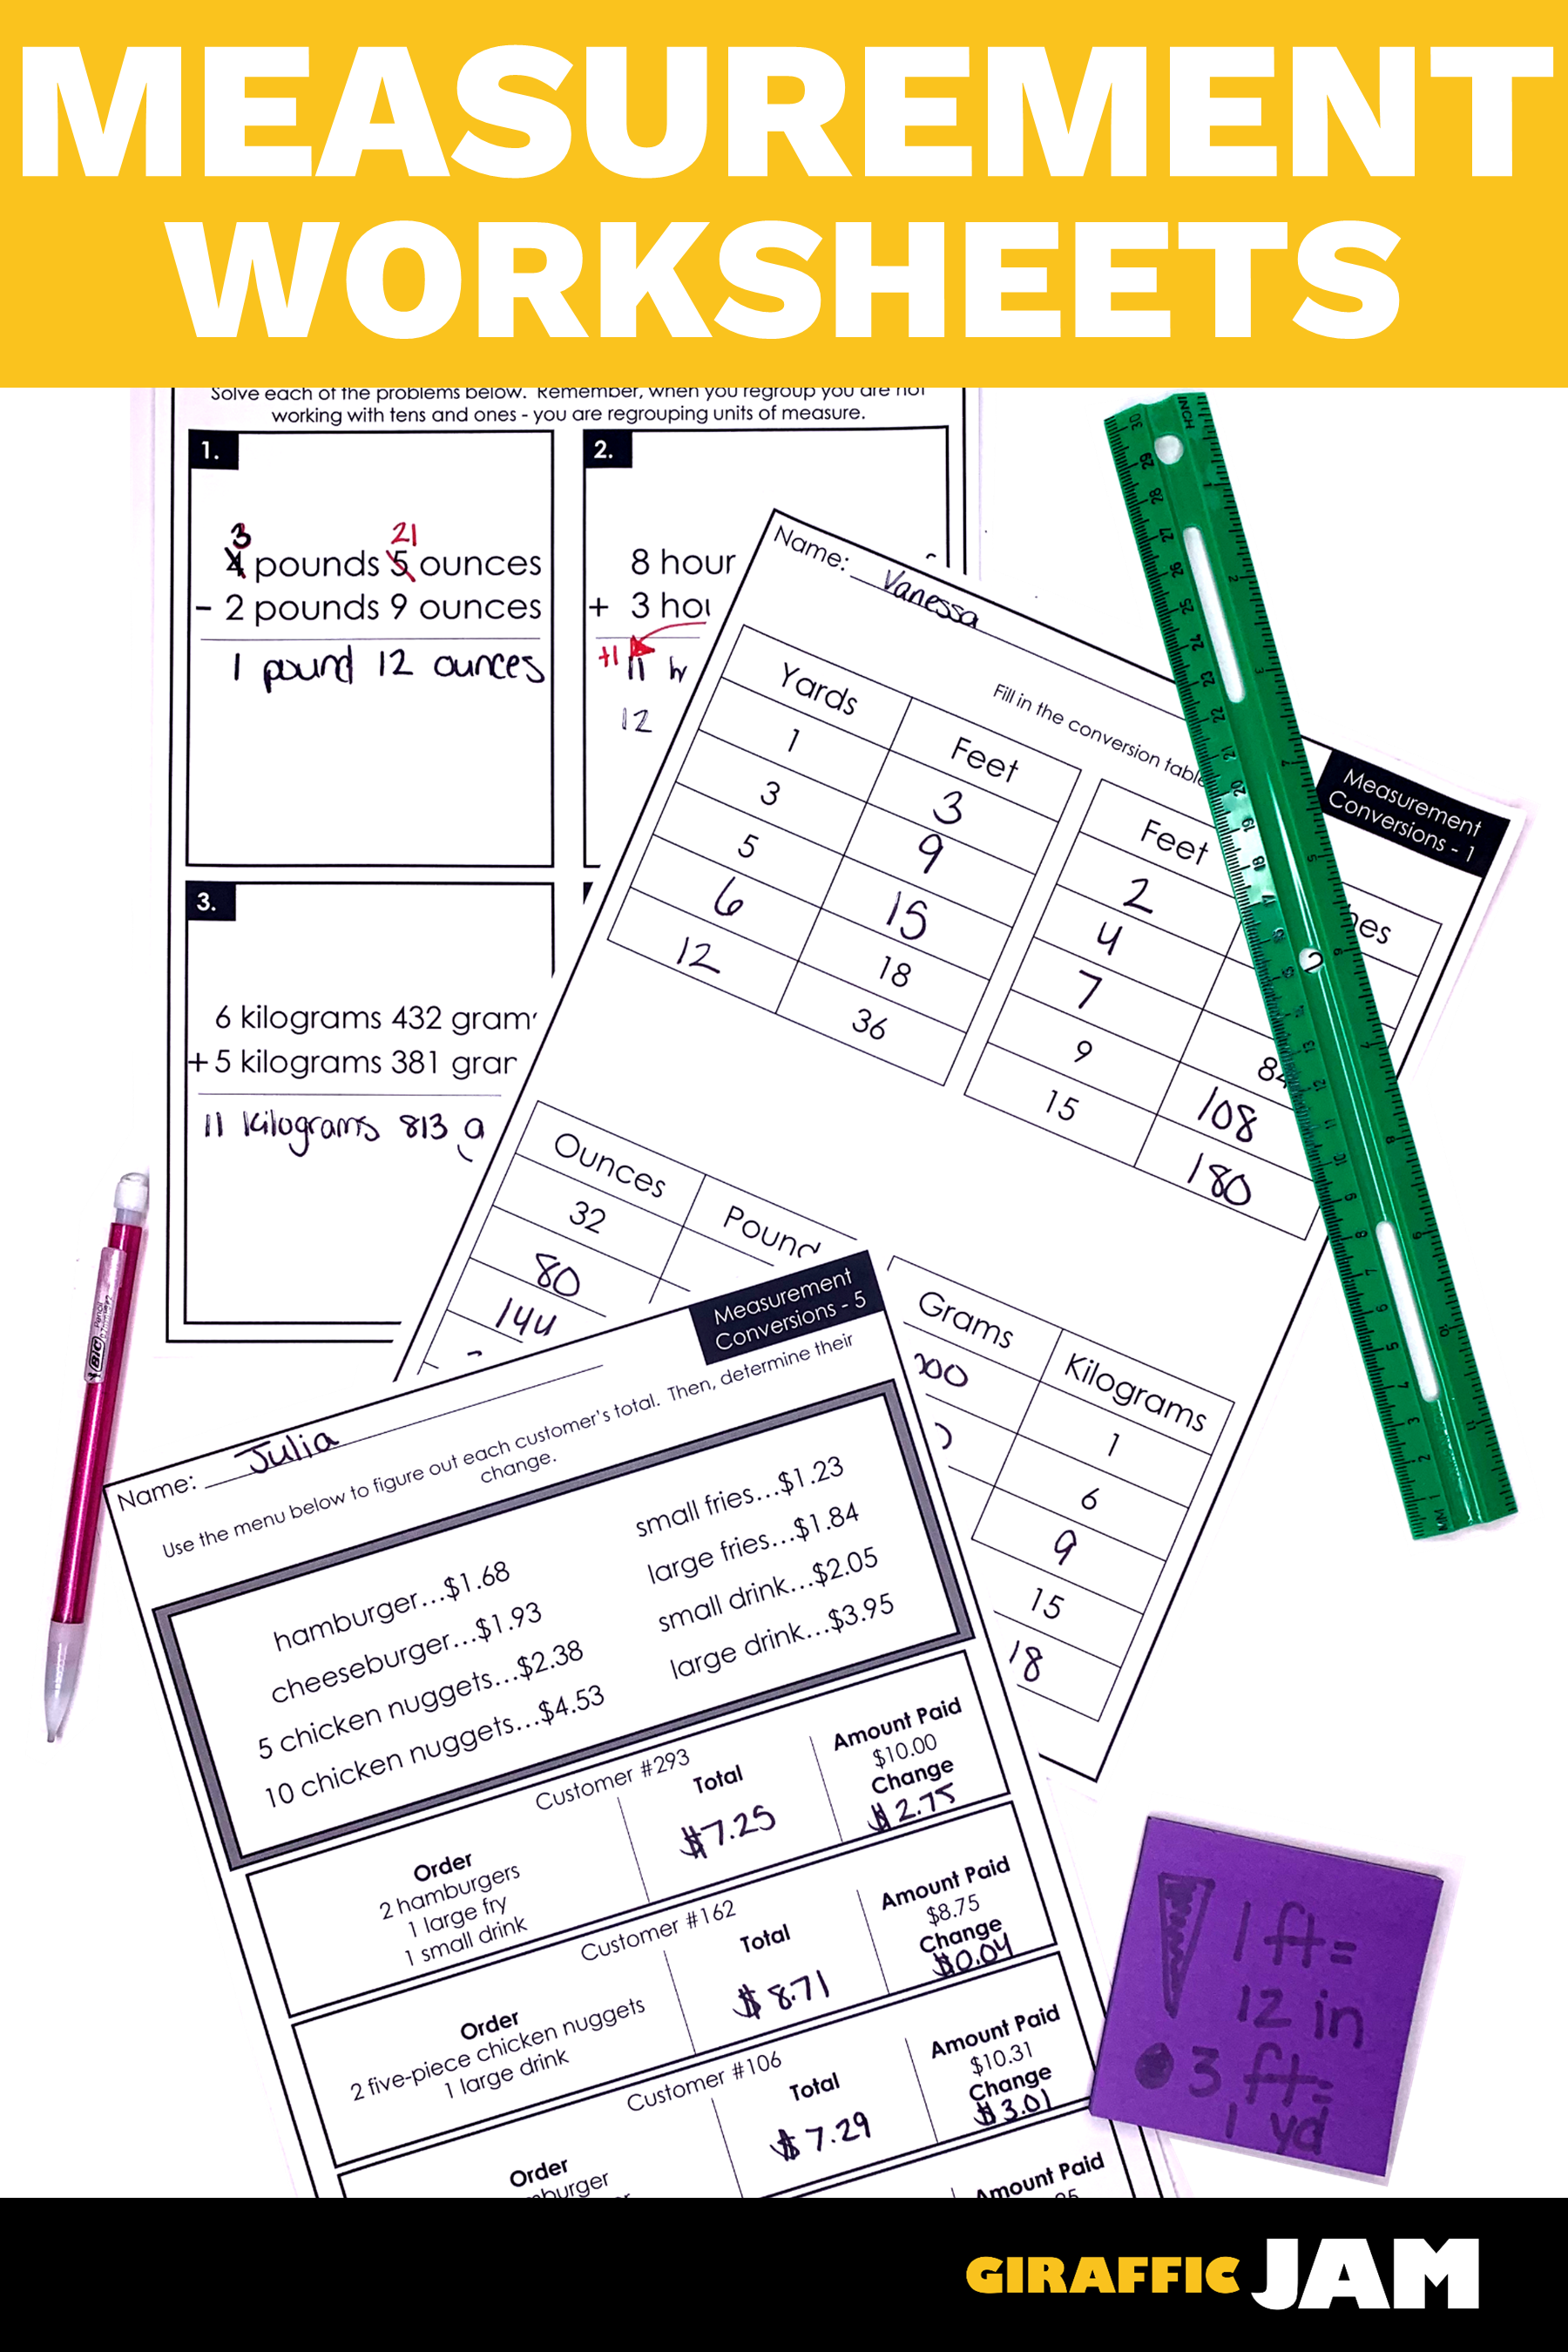 4th Grade fractions   Converting Measurements   Measurement Worksheets   4th  Grade Math W…   Measurement worksheets [ 2700 x 1800 Pixel ]